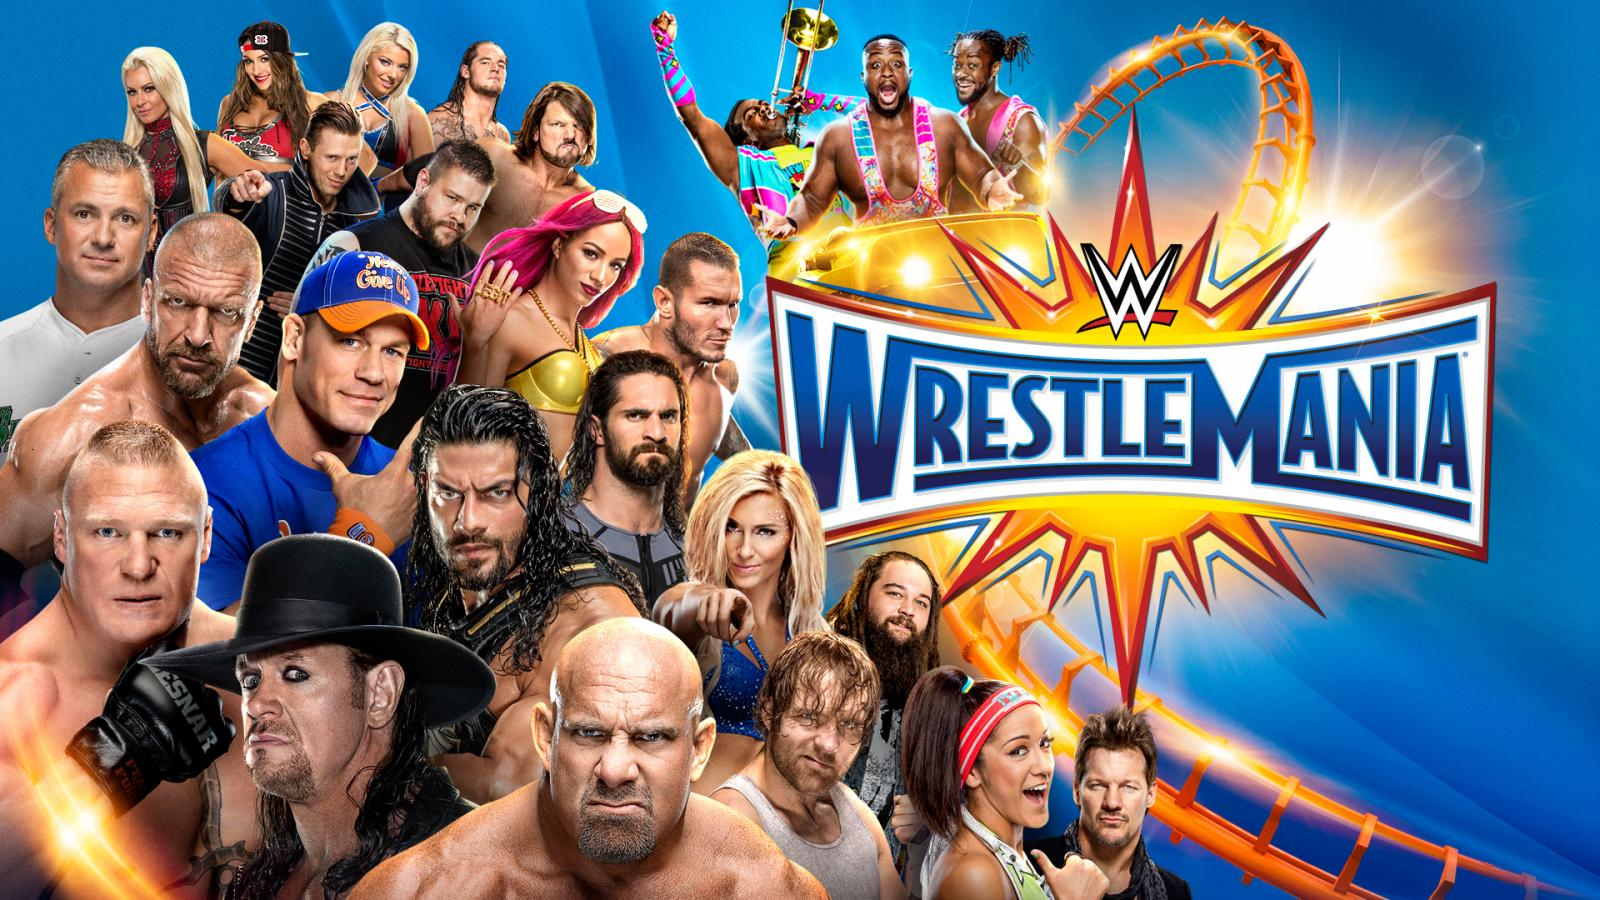 wrestlemania 33, wwe free ppv, wwe free live stream, WWE wrestlemania 33 live stream